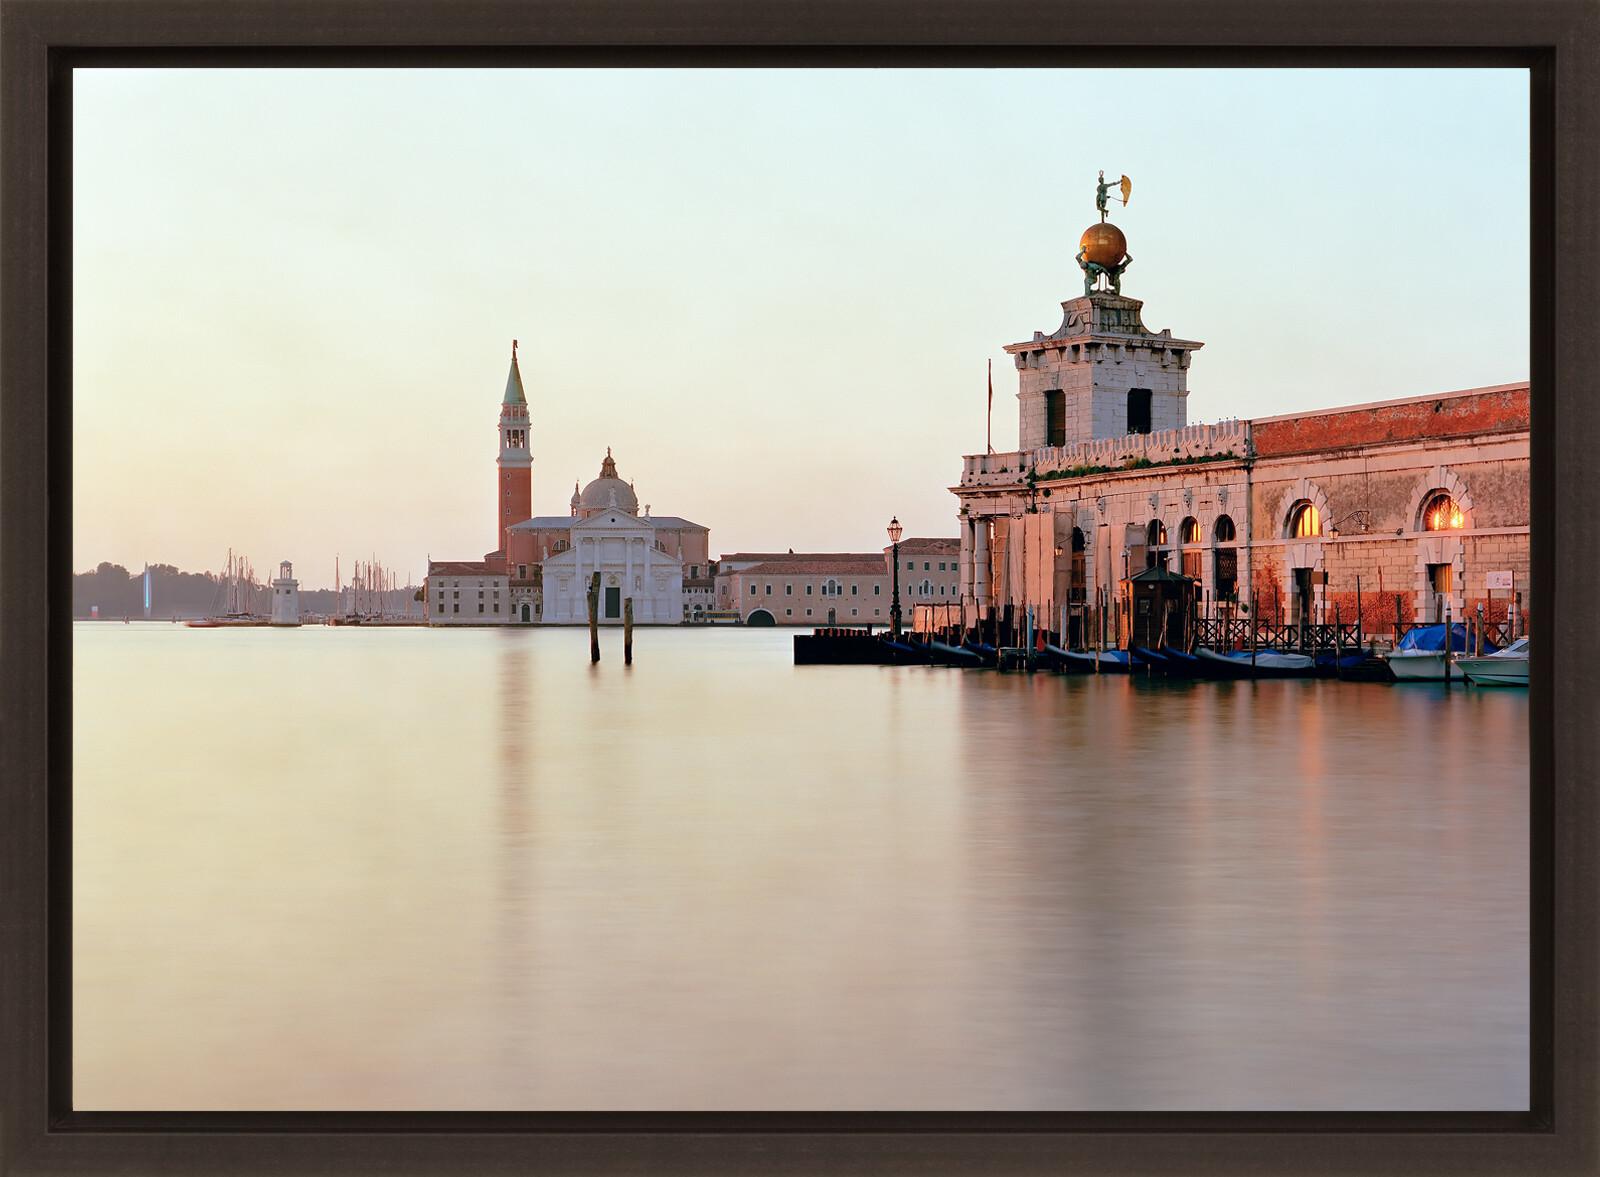 Venezia I - Ralph Hinterkeuser